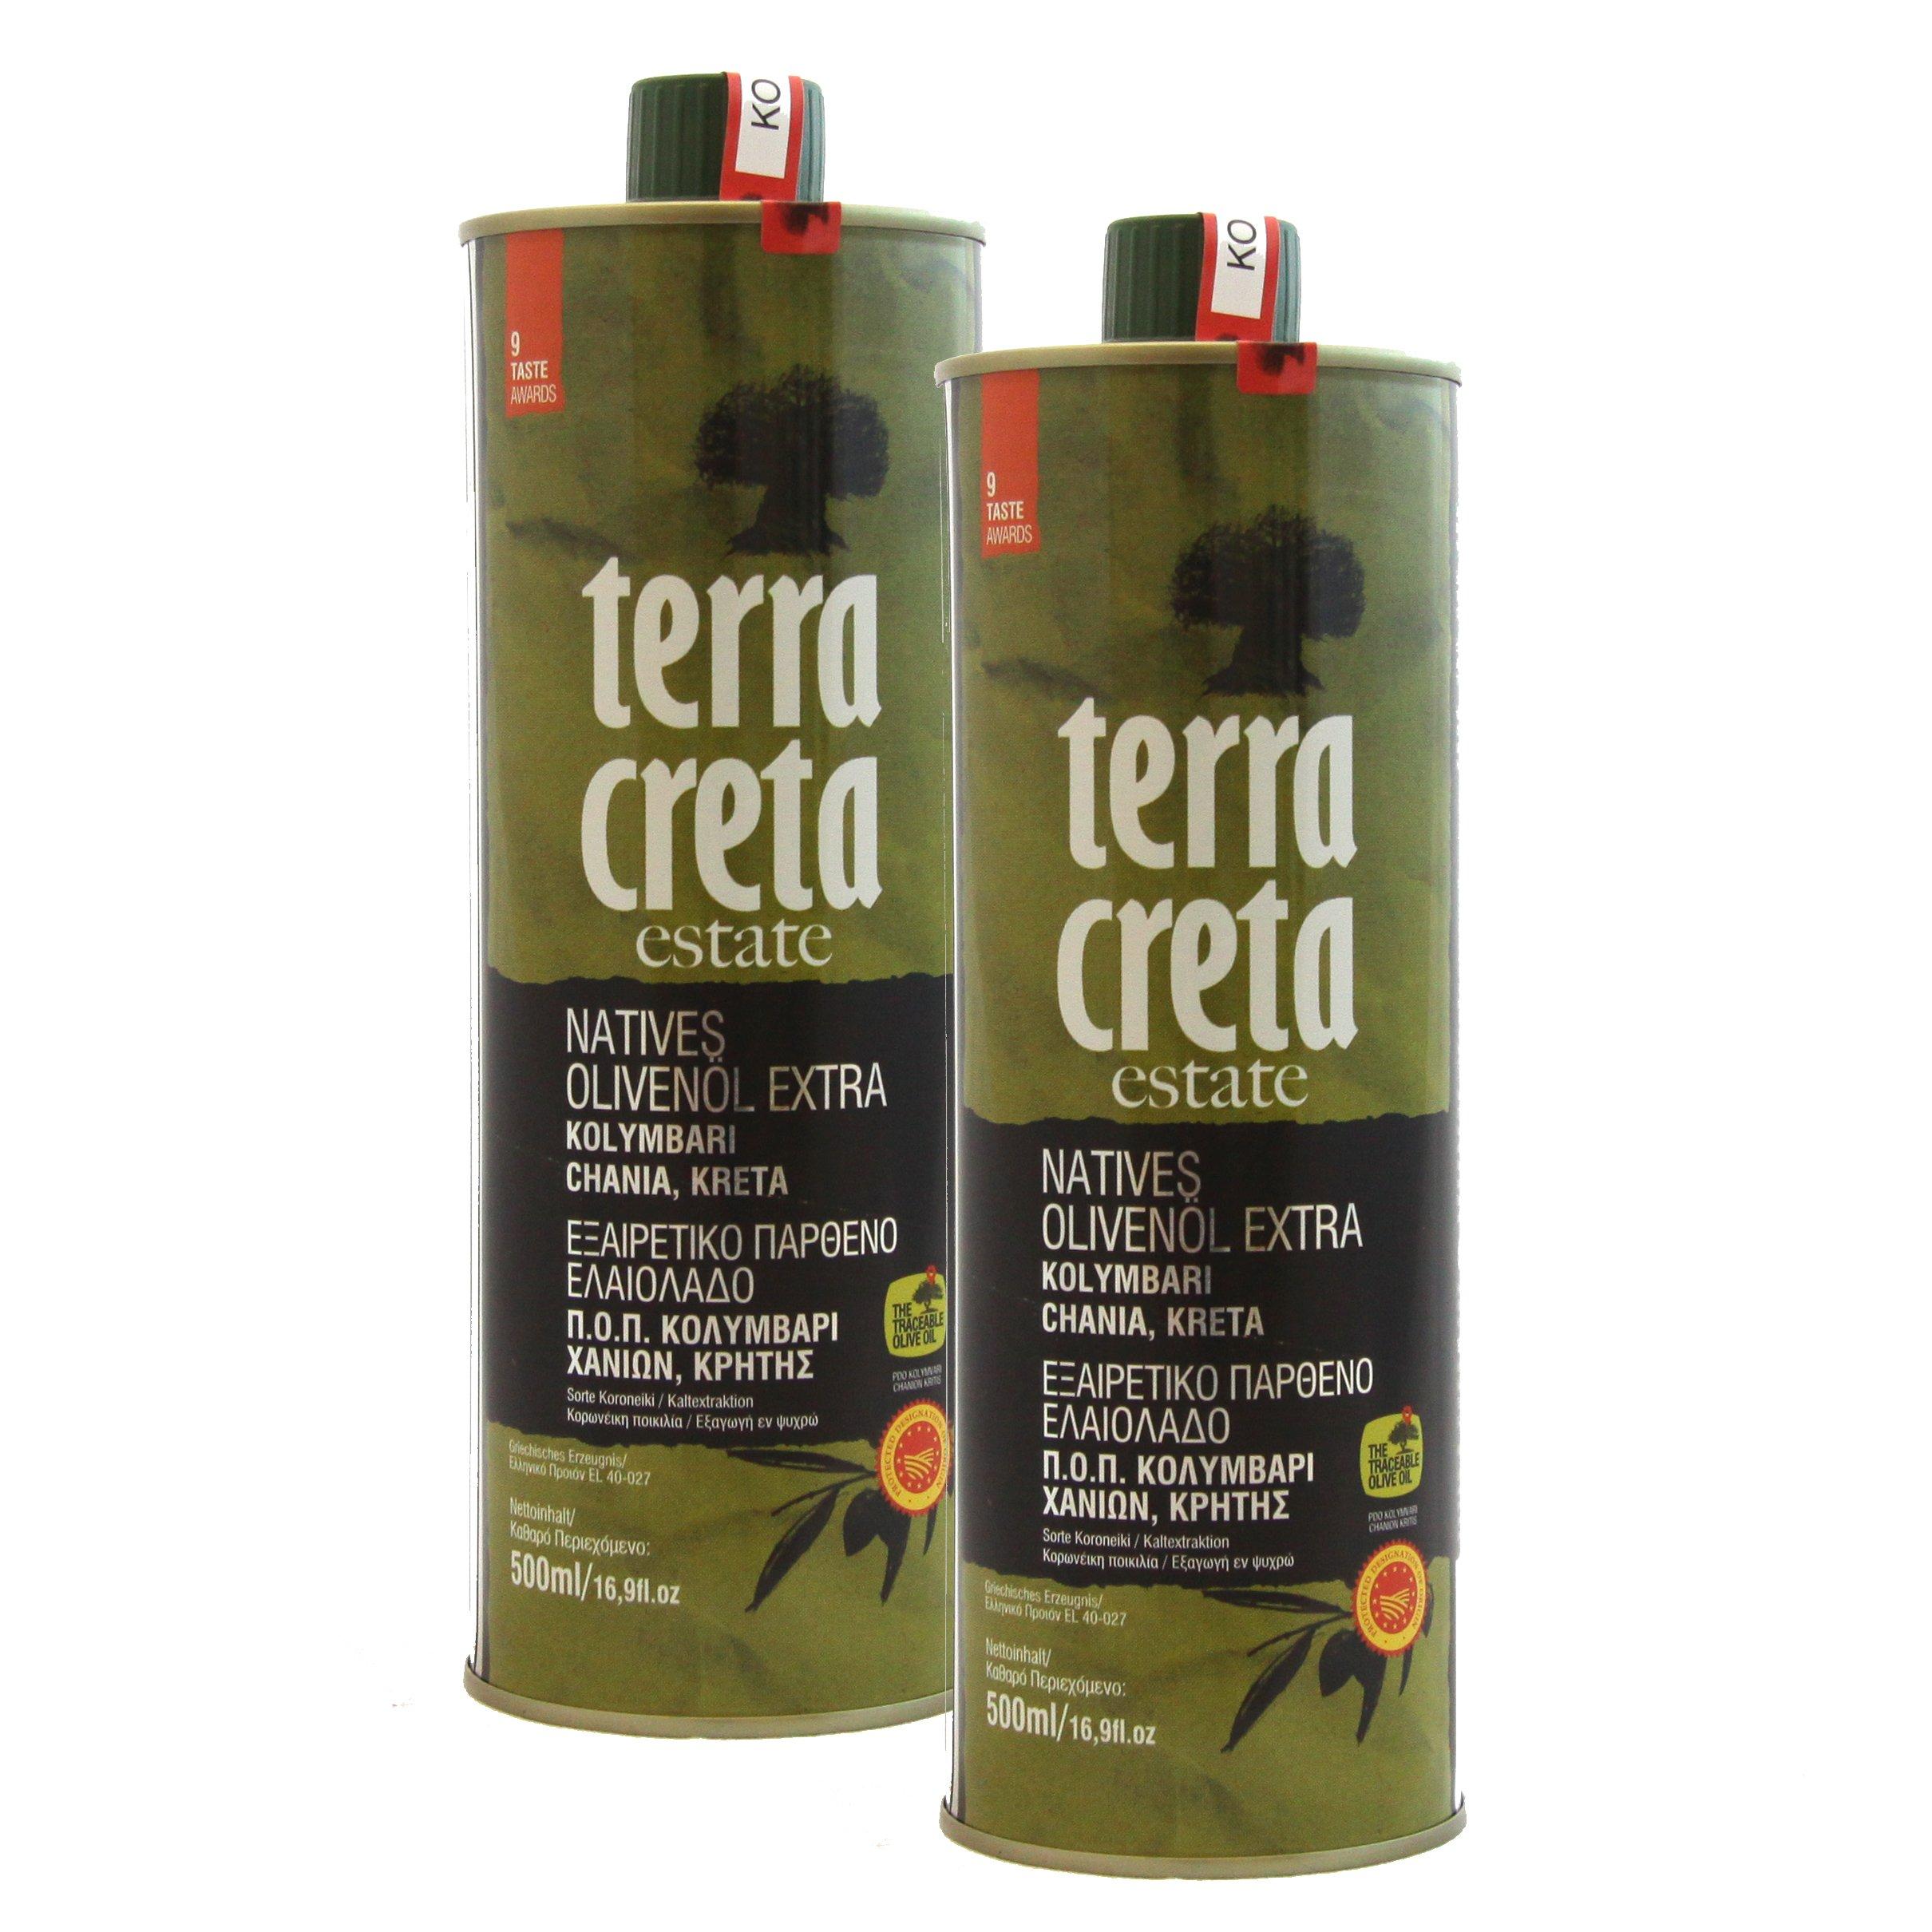 Terra Creta | Multiple Global Award Winning Extra Virgin Olive Oil | Current Harvest 2017-2018 | Single Estate Olive Oil | 500ml X 2 Tins | Pack of 2